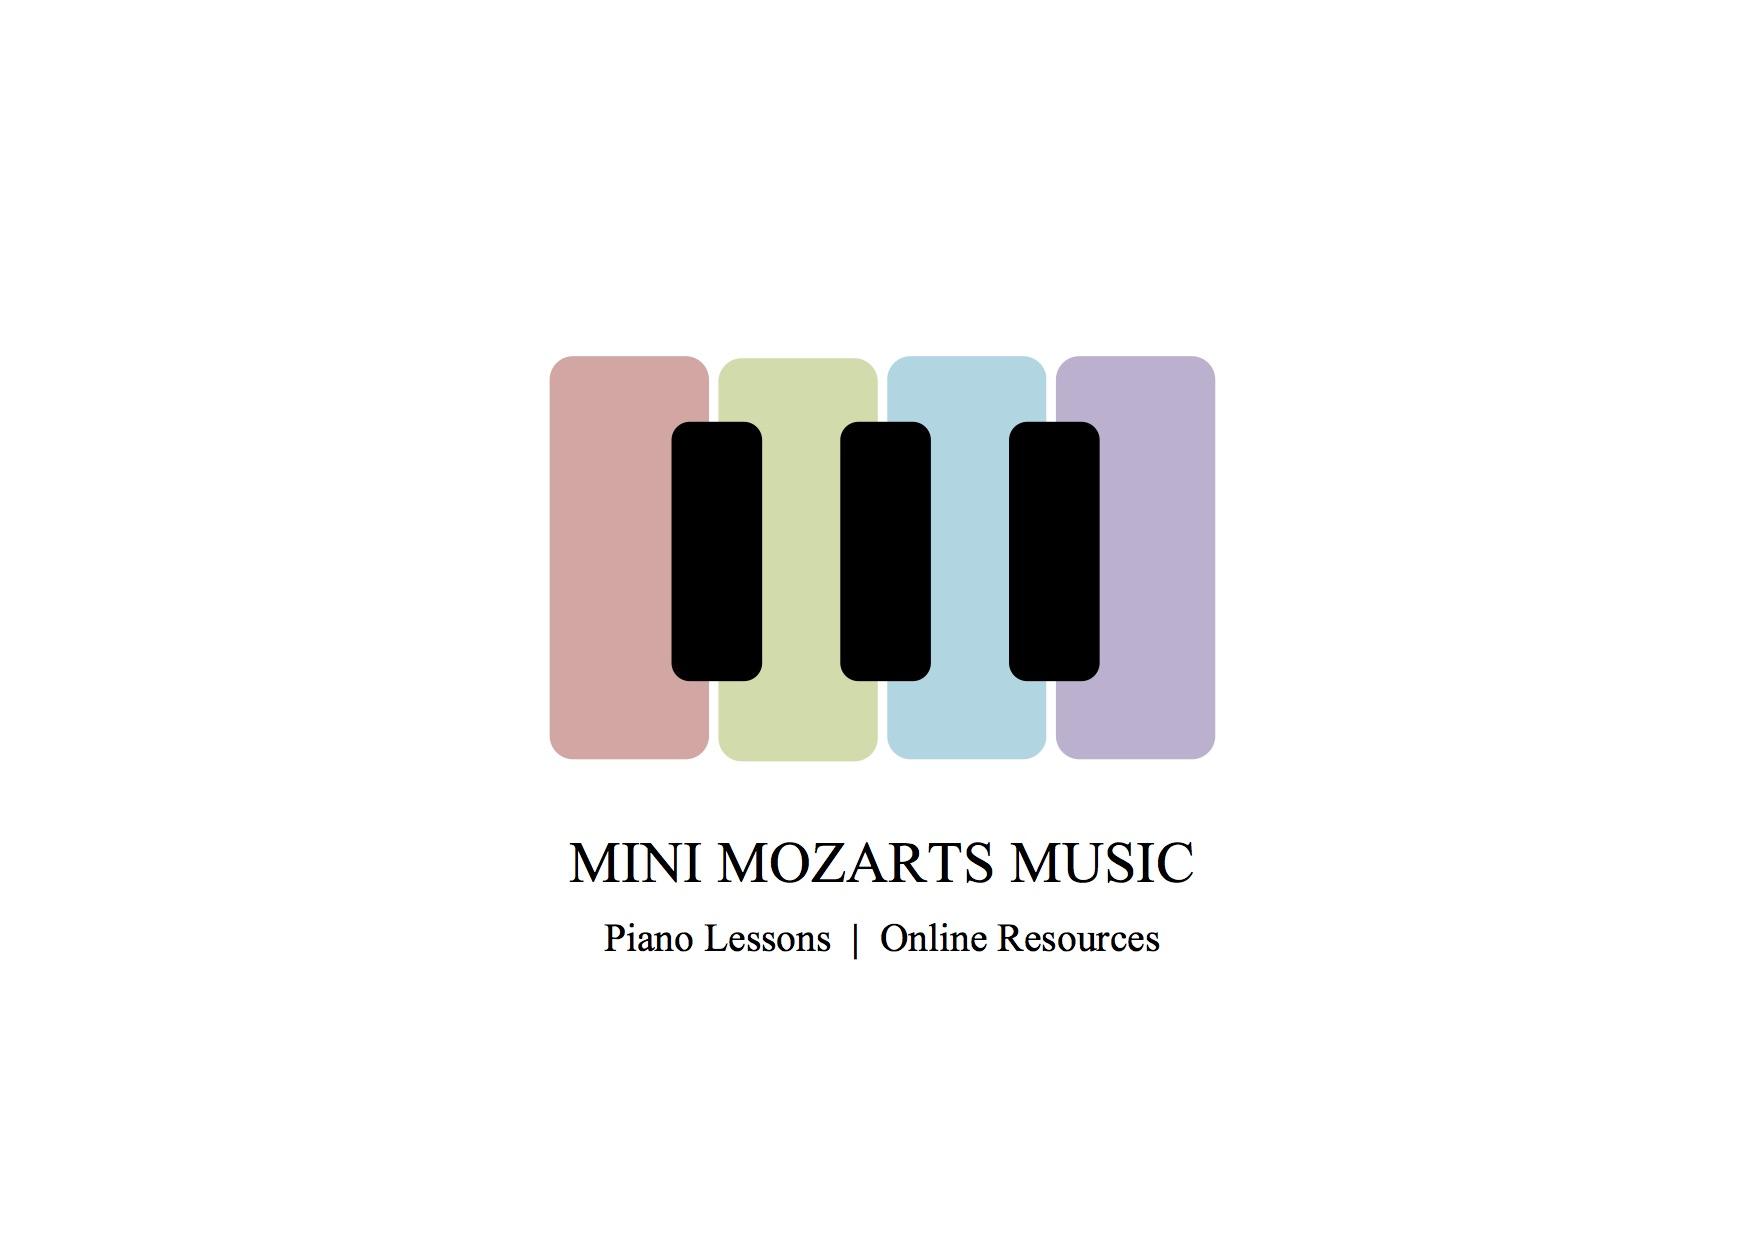 Mini Mozarts